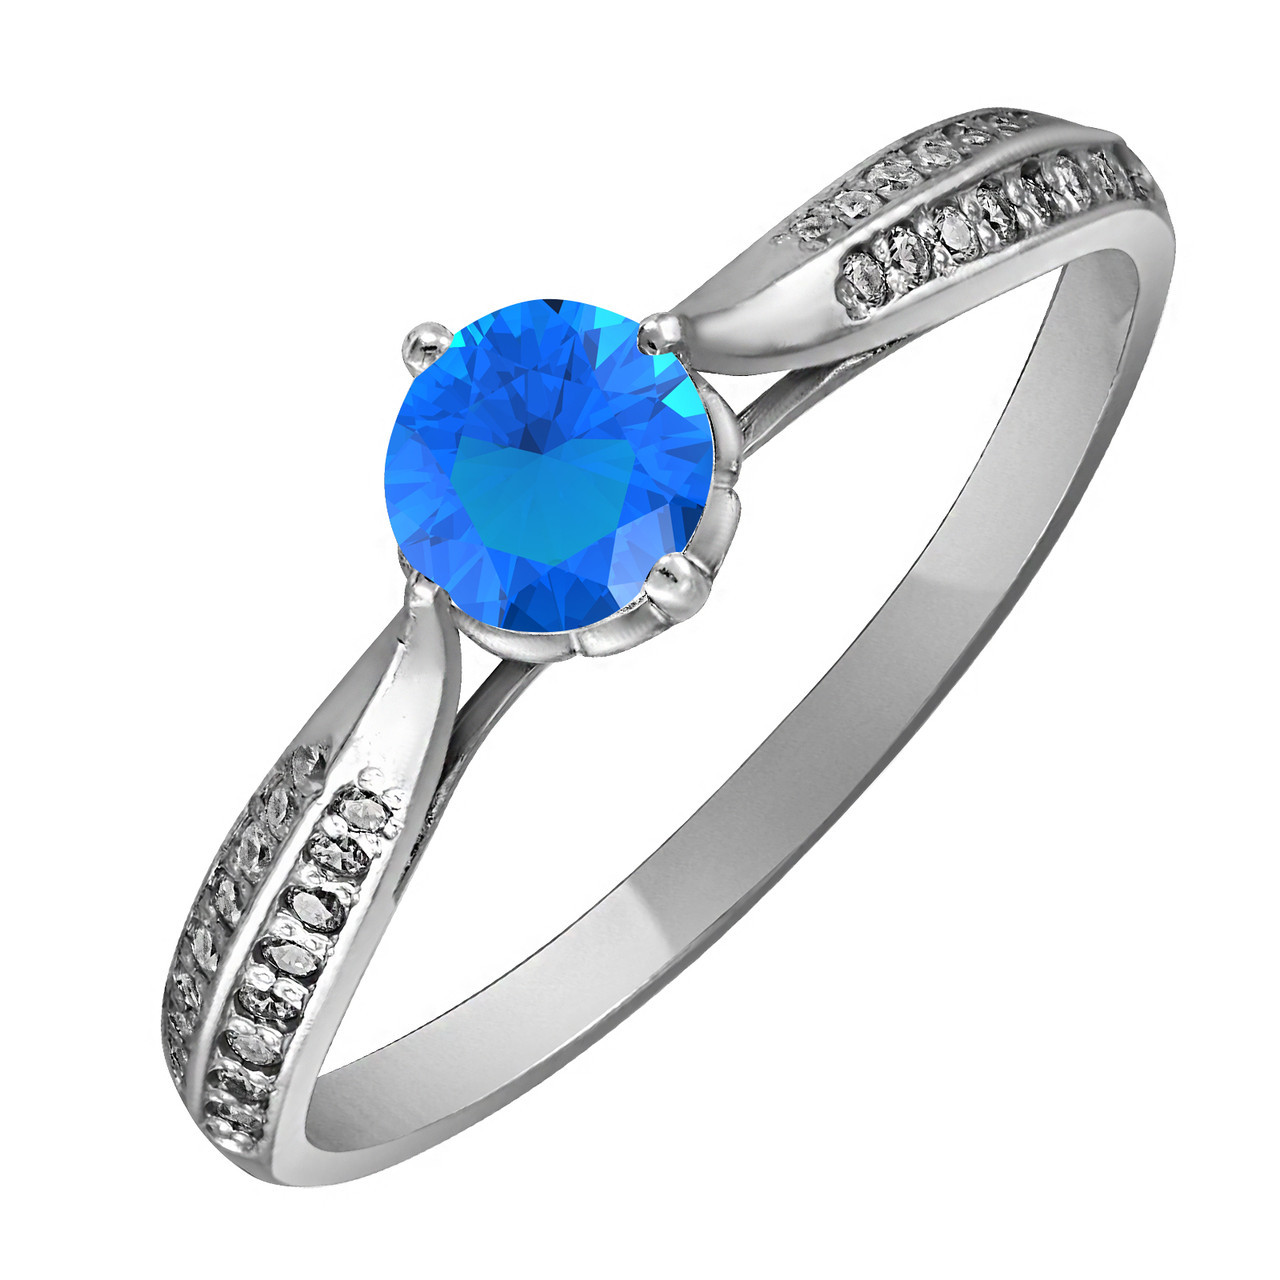 Кольцо из серебра с голубым кубическим цирконием Twiddle Jewelry 18.0 размер (К007г-18.0)